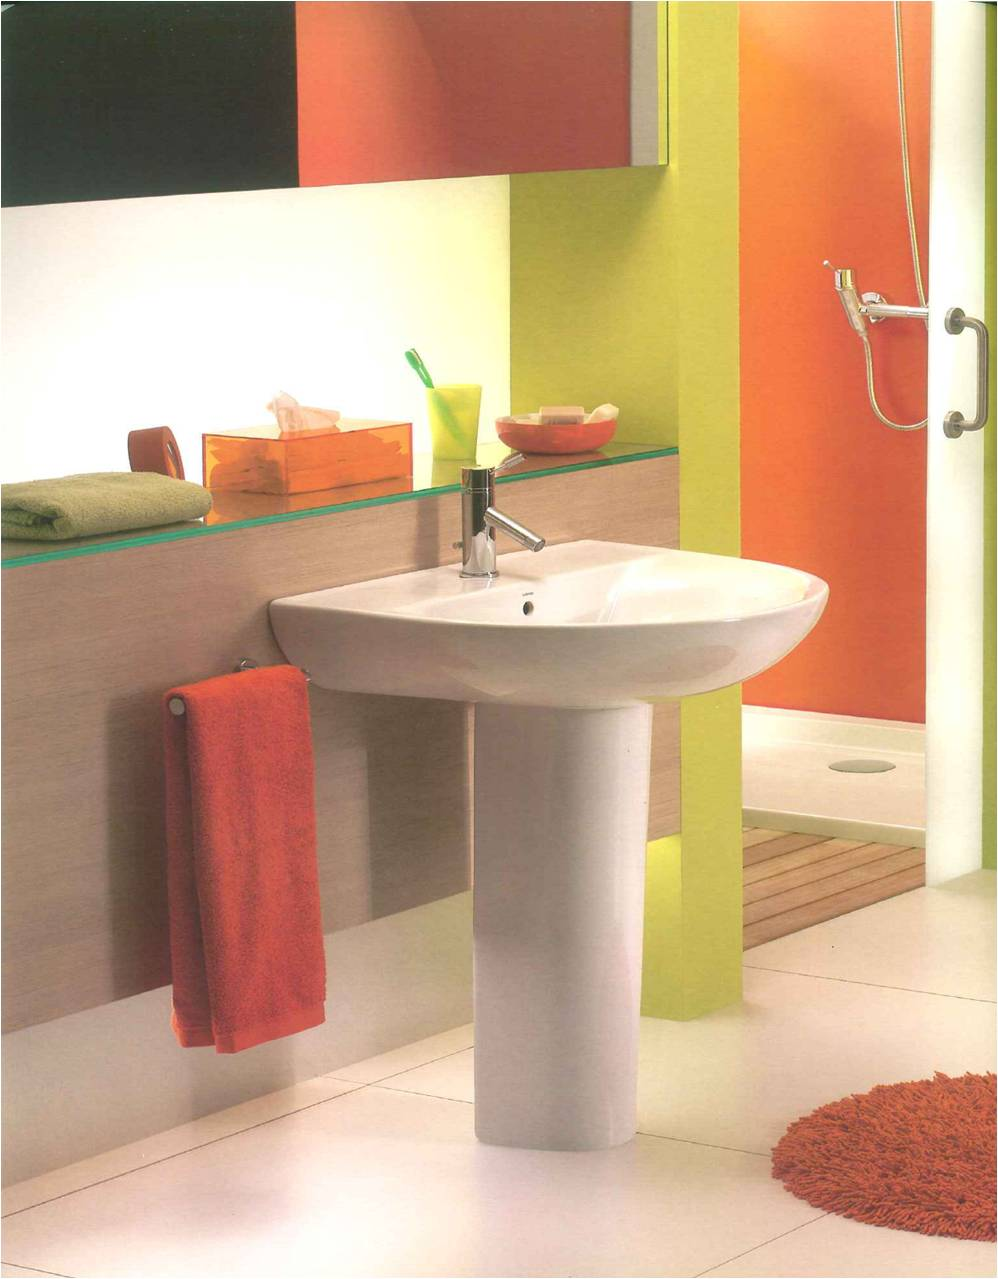 faca voce mesmo decoracao de interiores:decoracao-de-casas-de-banho-casa-de-banho-de-varias-cores